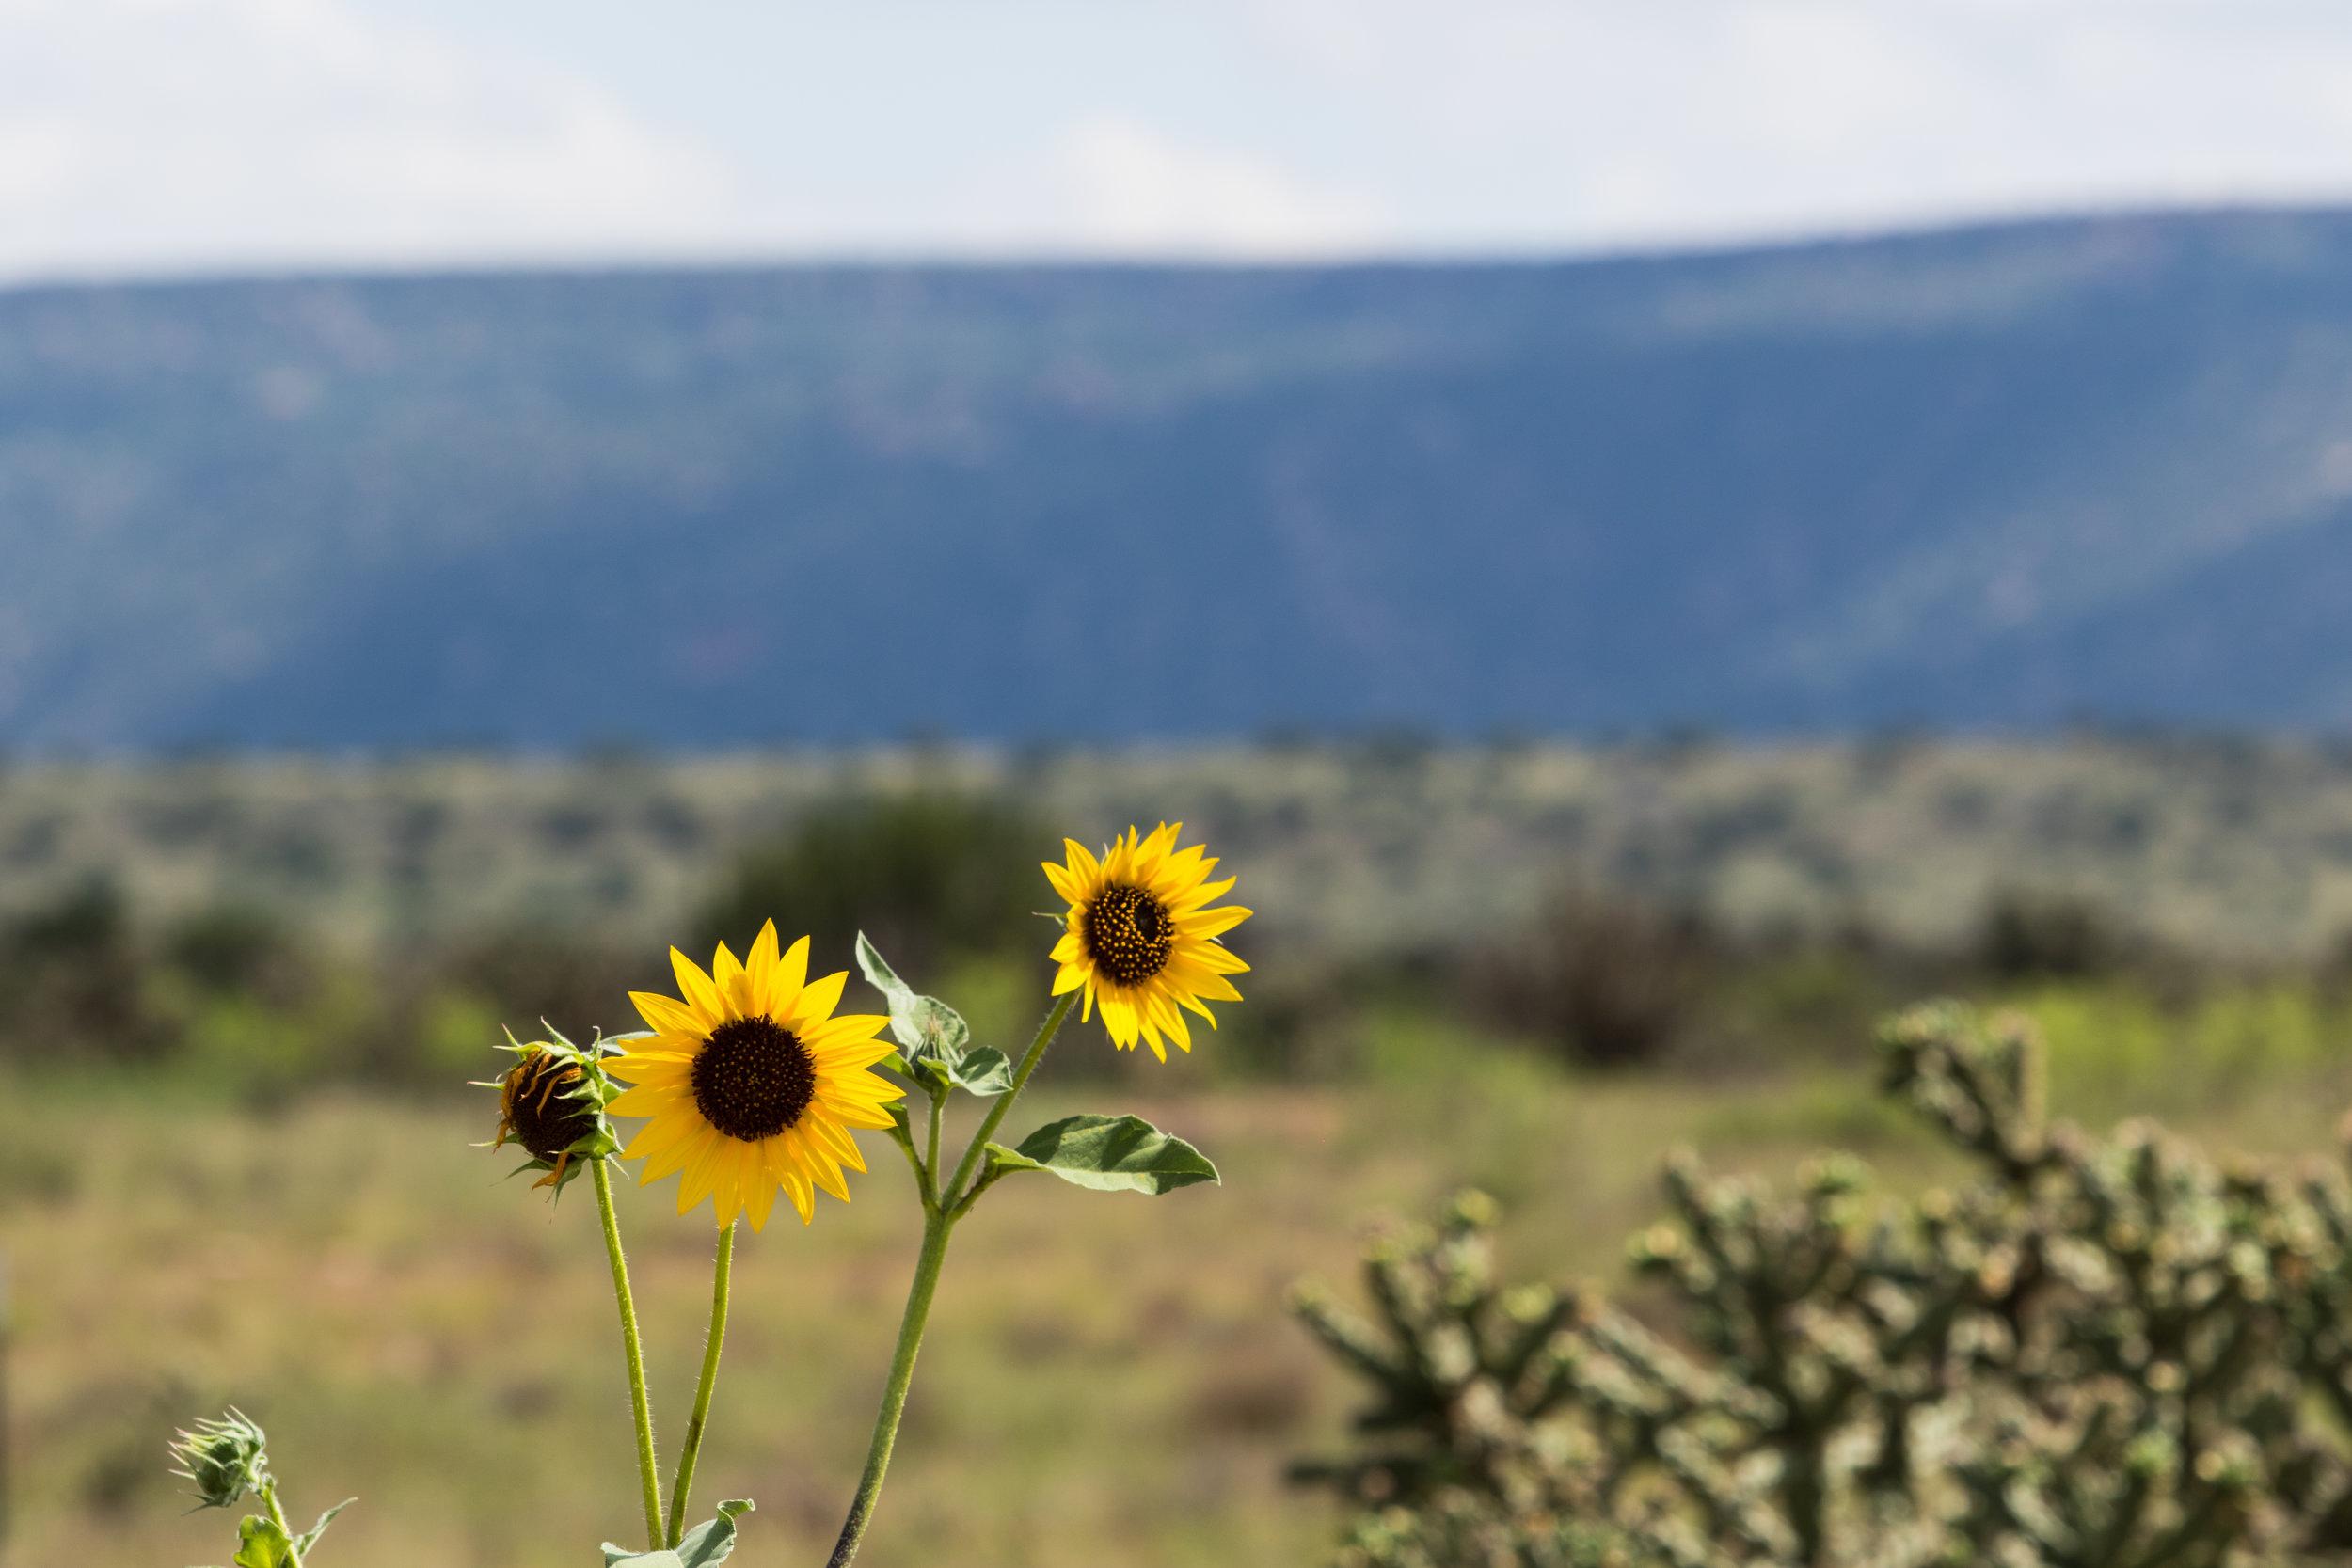 Road side sunflower